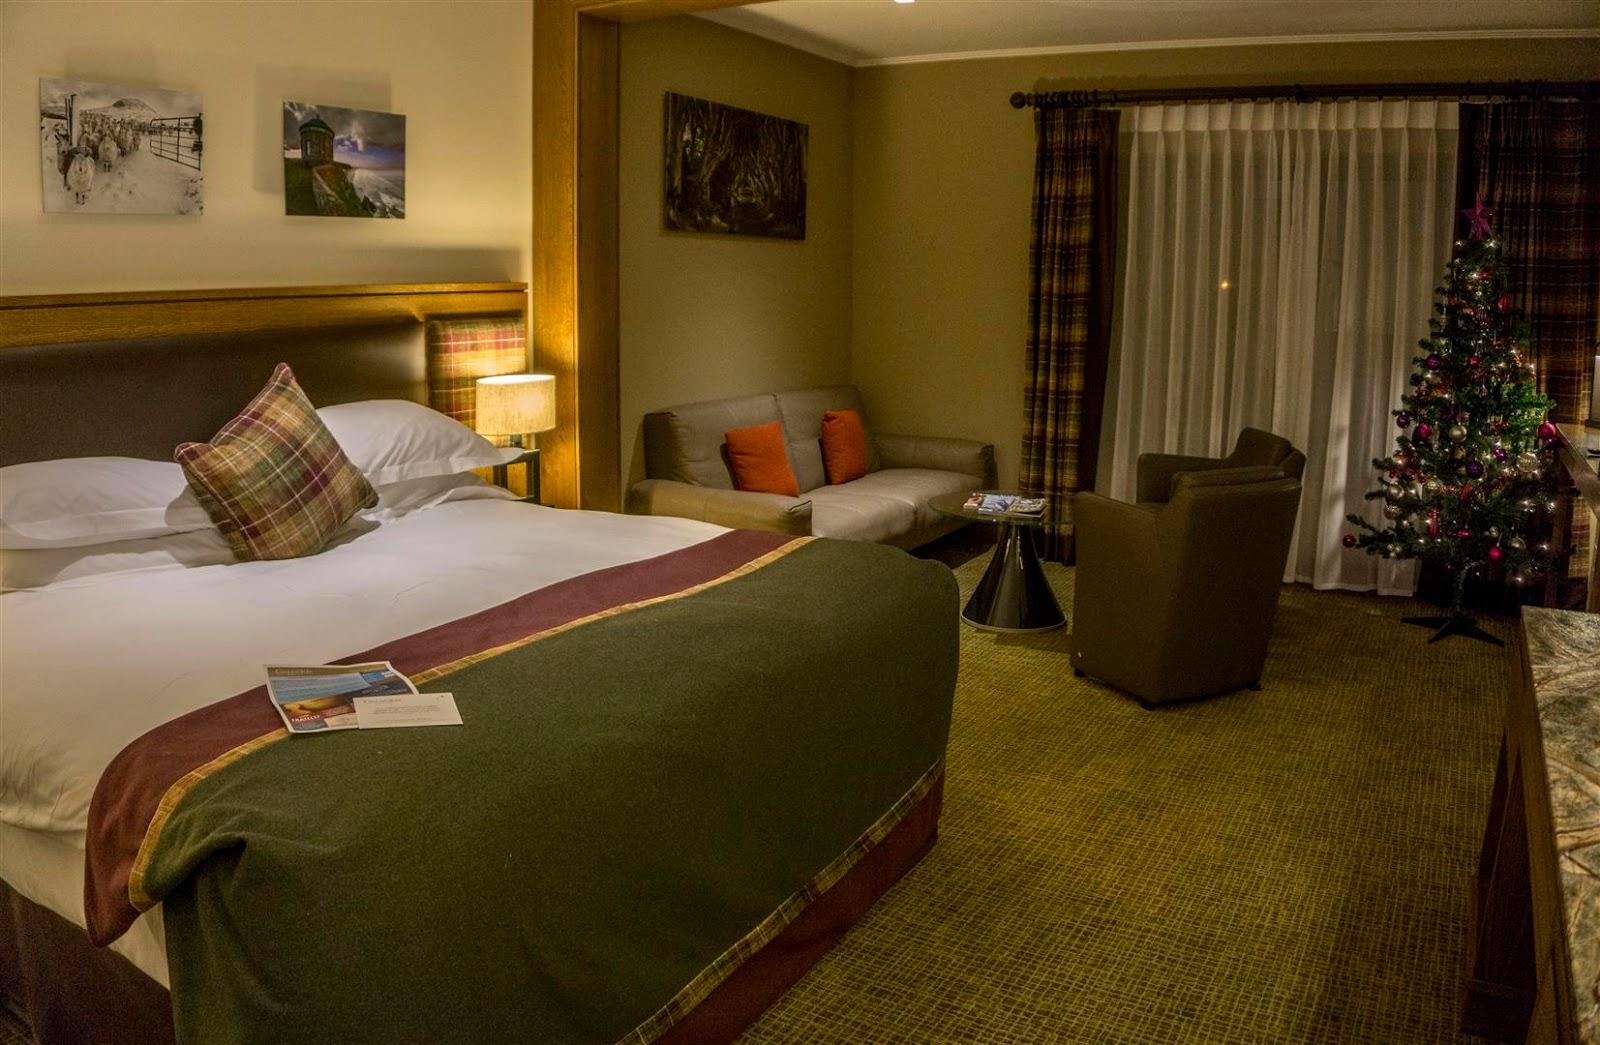 Uncategorized/luxury designer bedding/abernathy - River Room At Galgorm Resort Spa